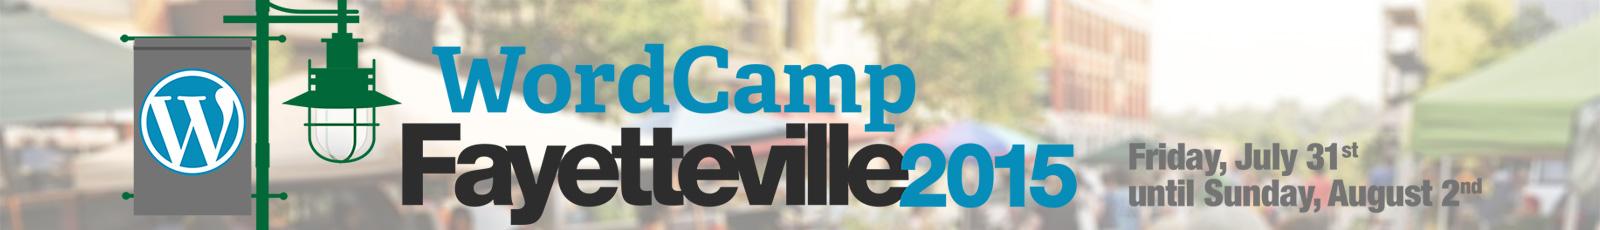 WordCamp Fayetteville Header 2015